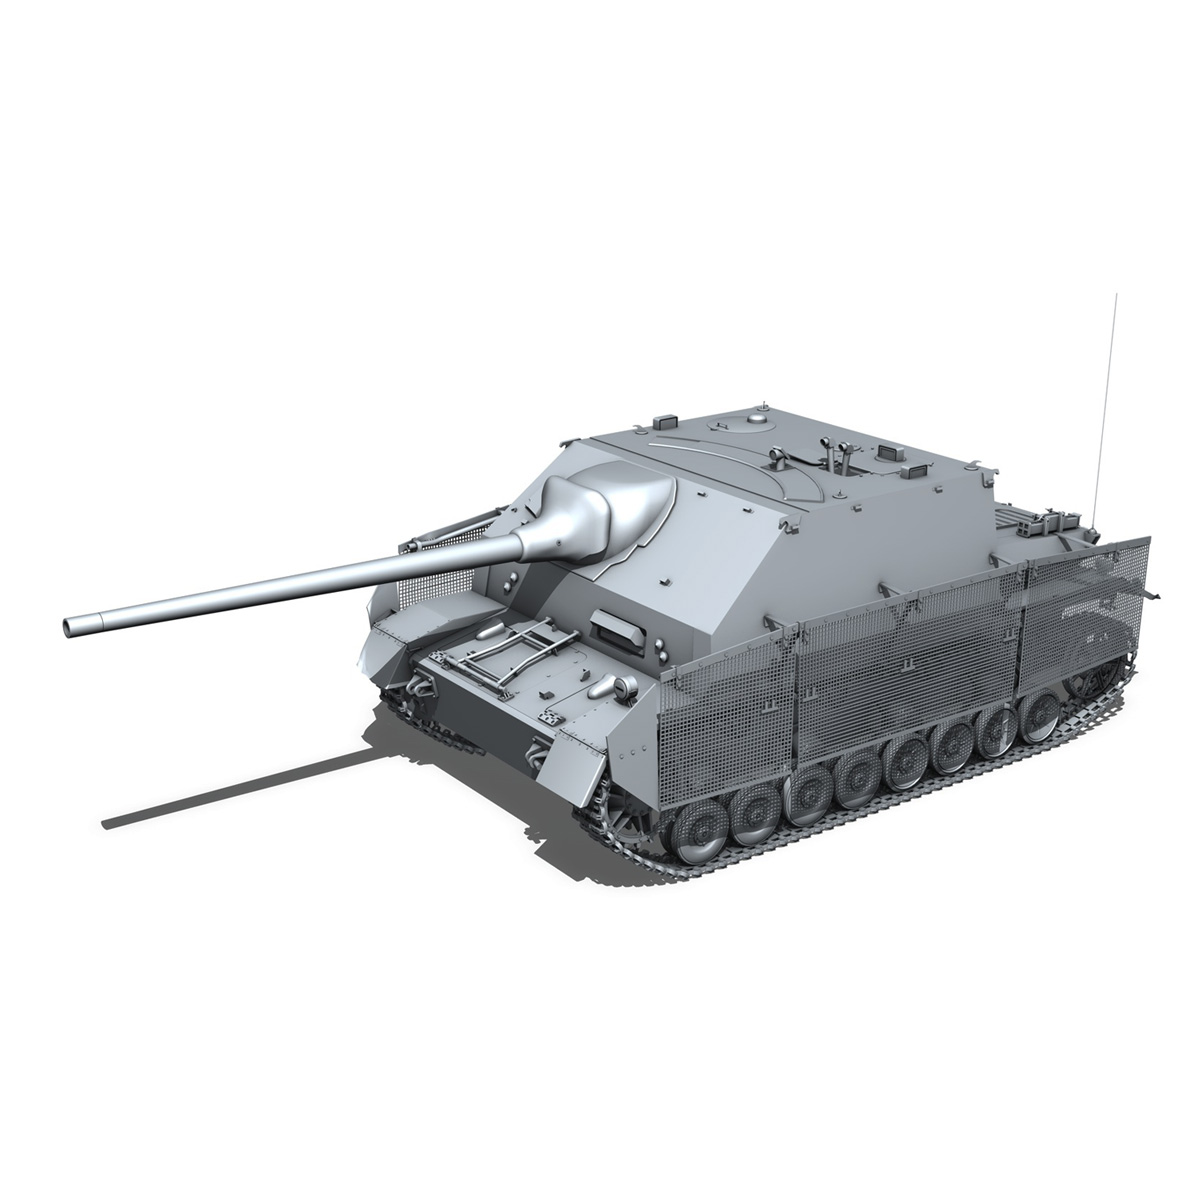 jagdpanzer iv l/70 (a) – sd.kfz 162/1 3d model 3ds fbx c4d lwo obj 202008